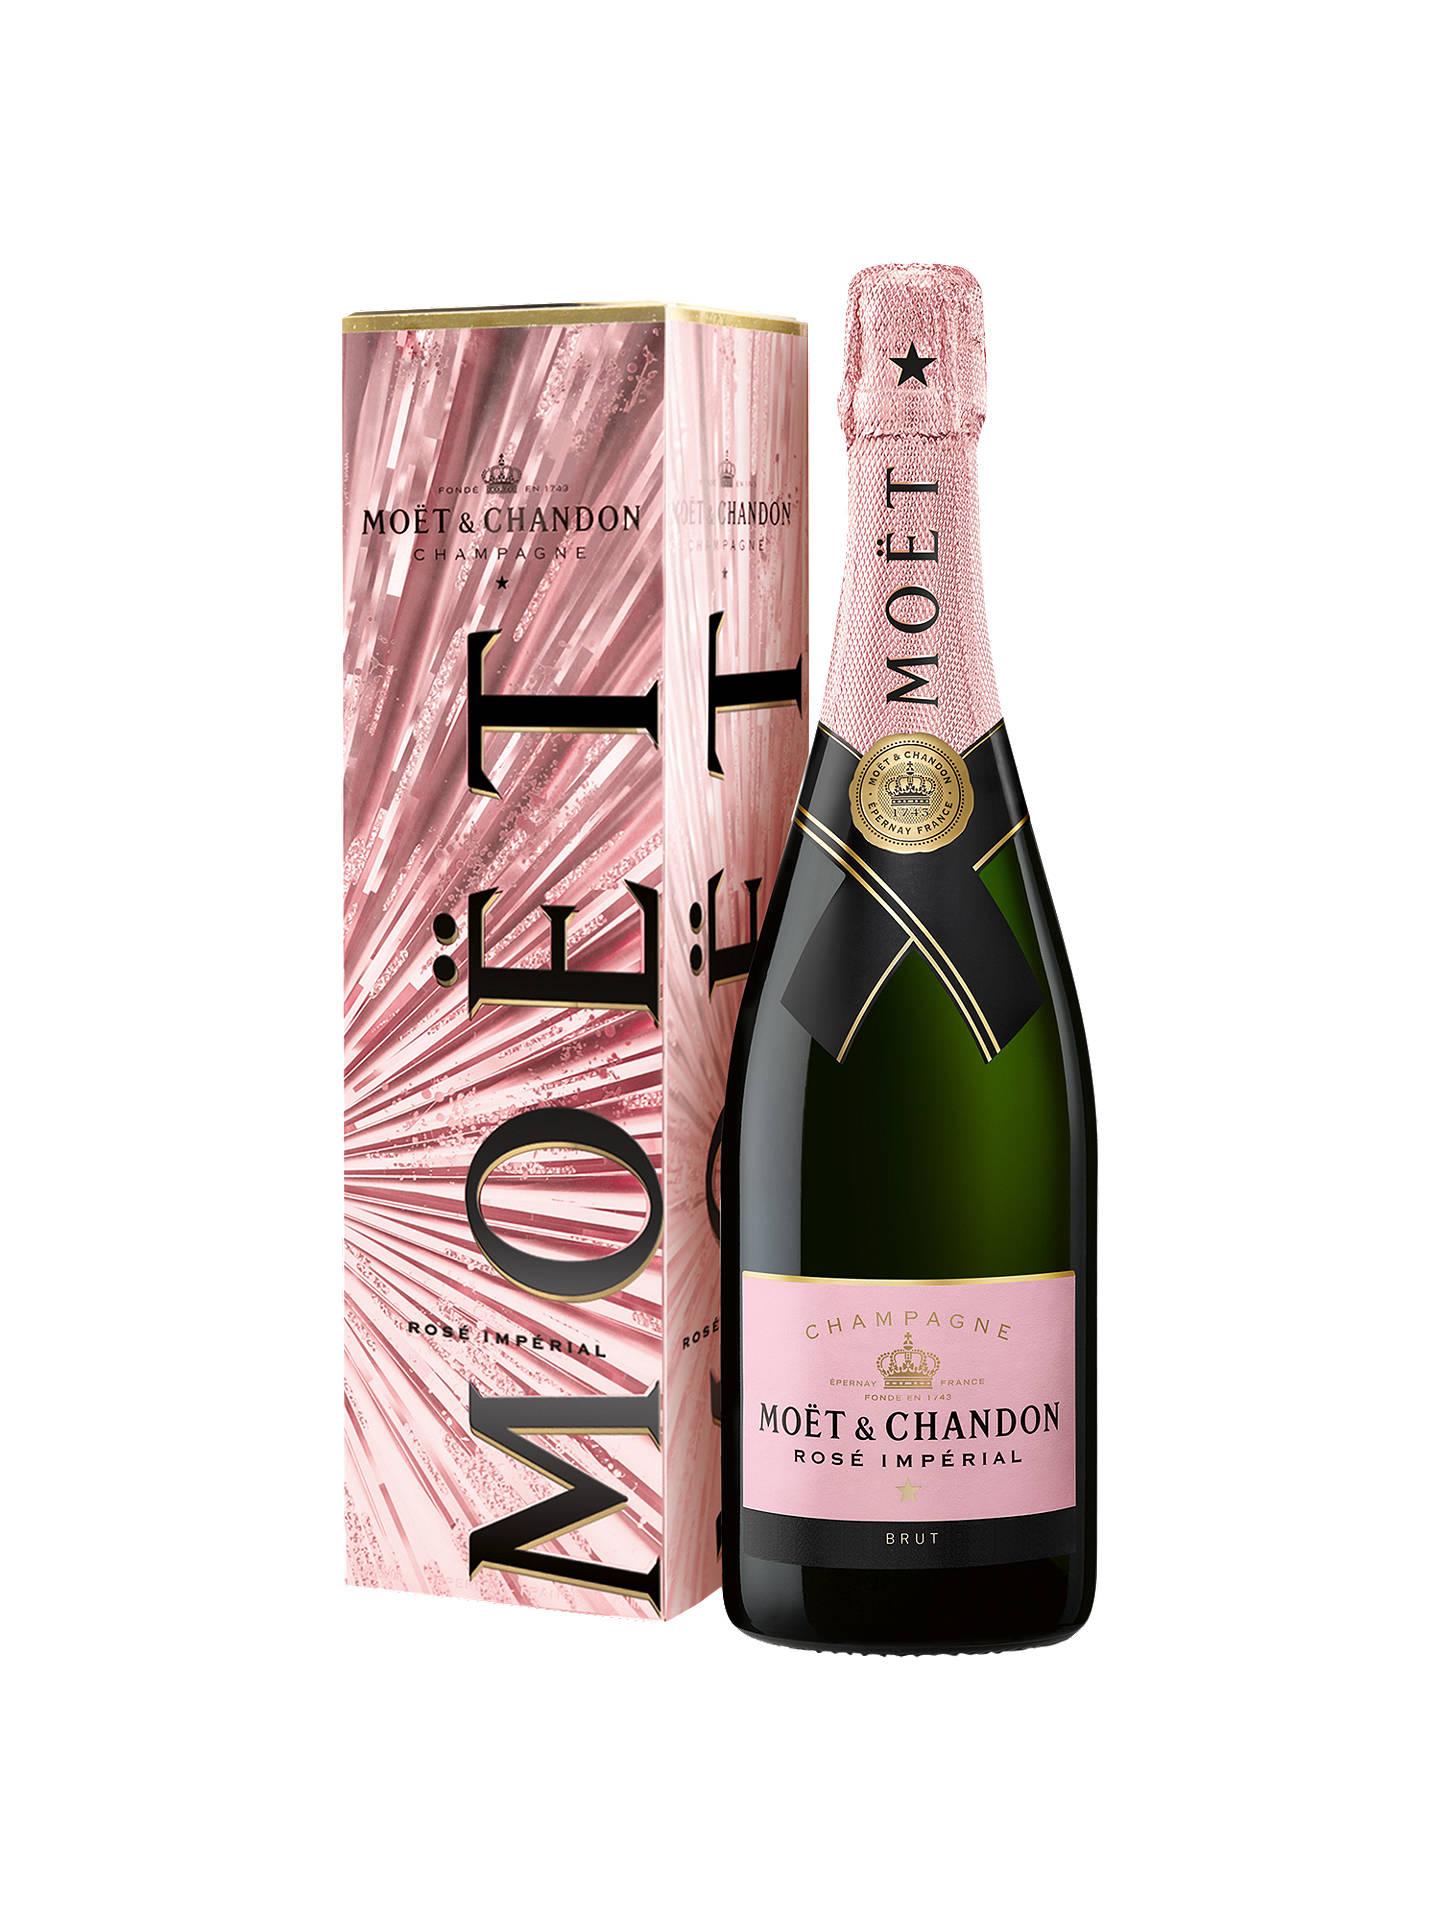 Moët & Chandon Rose Imperial Festive Box Brut Champagne, 75cl